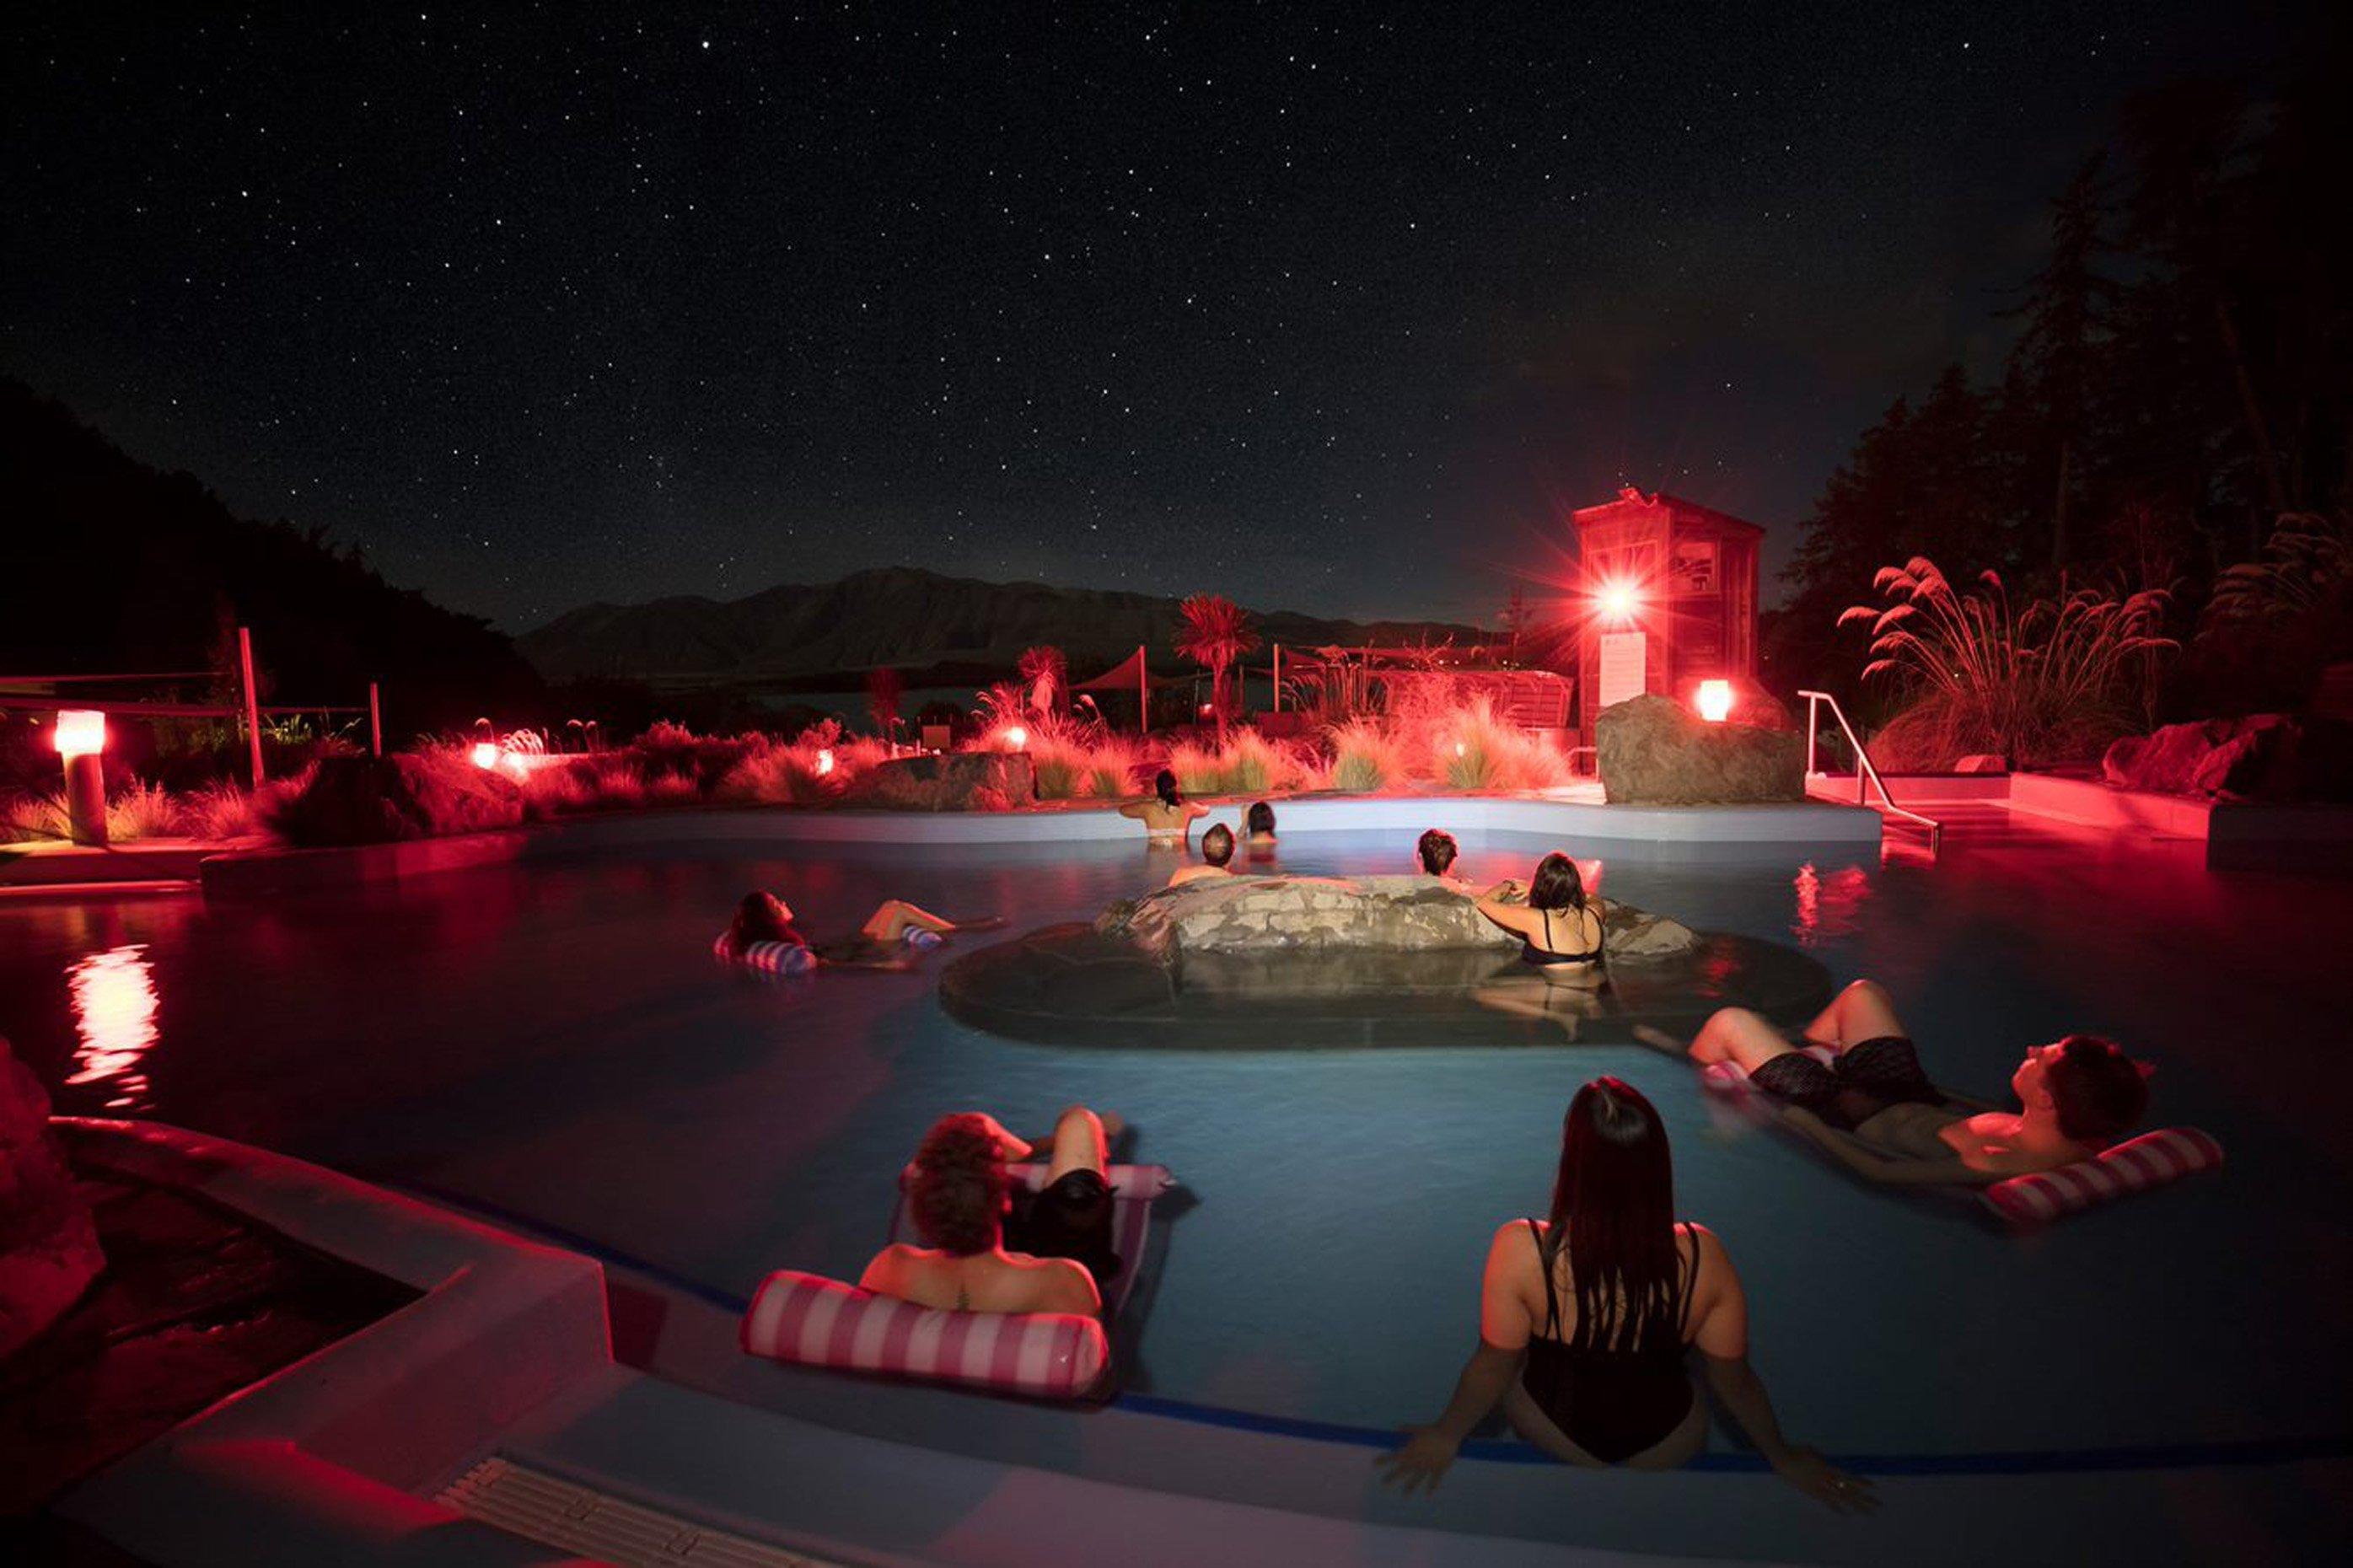 Romanced by starry skies and snowy mountains, Lisa Scott enjoys a Mackenzie honeymoon. PHOTO:...